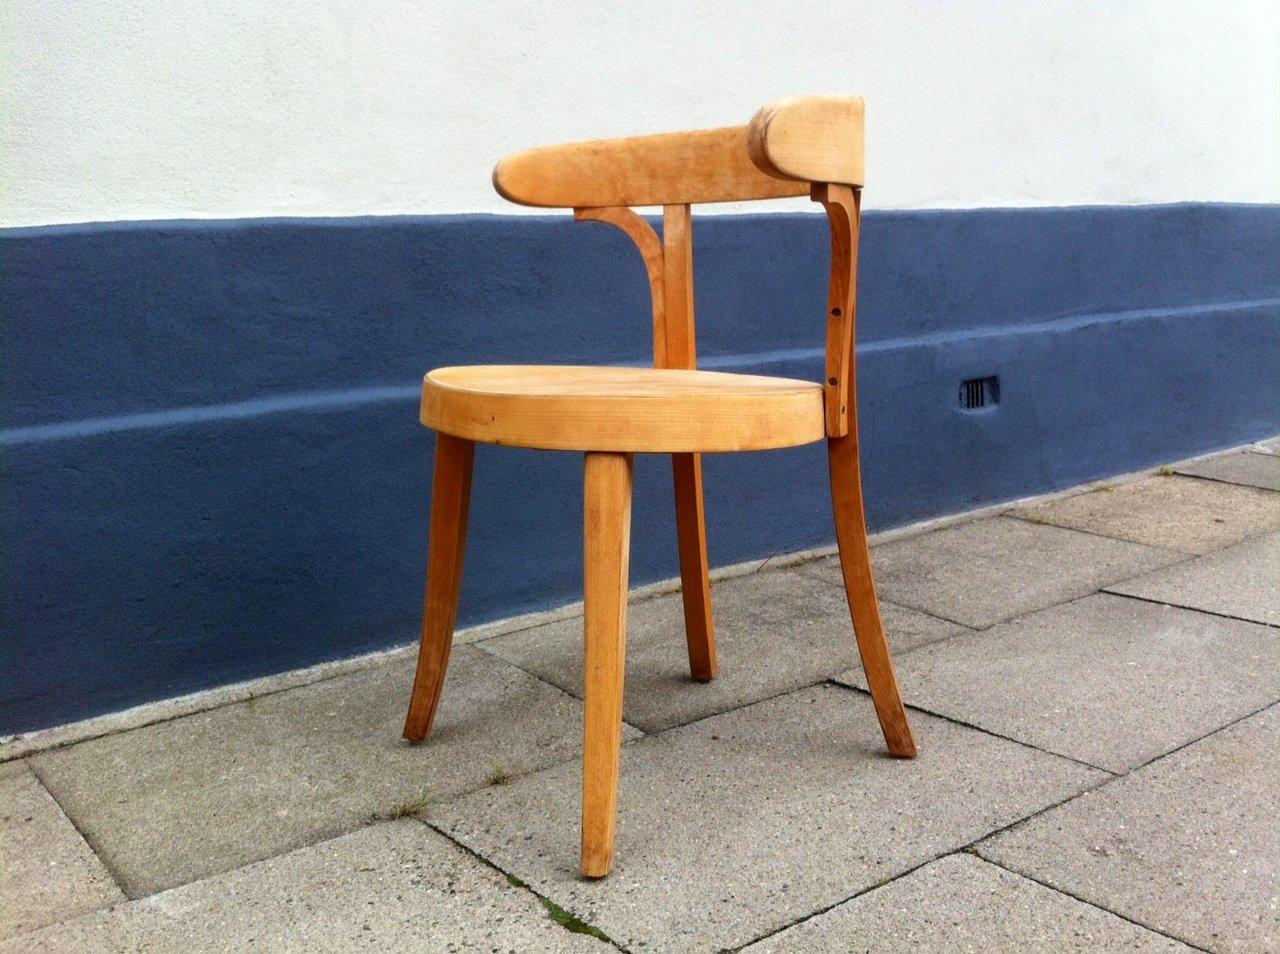 100 vintage style bar stools design elegant bar stools idea